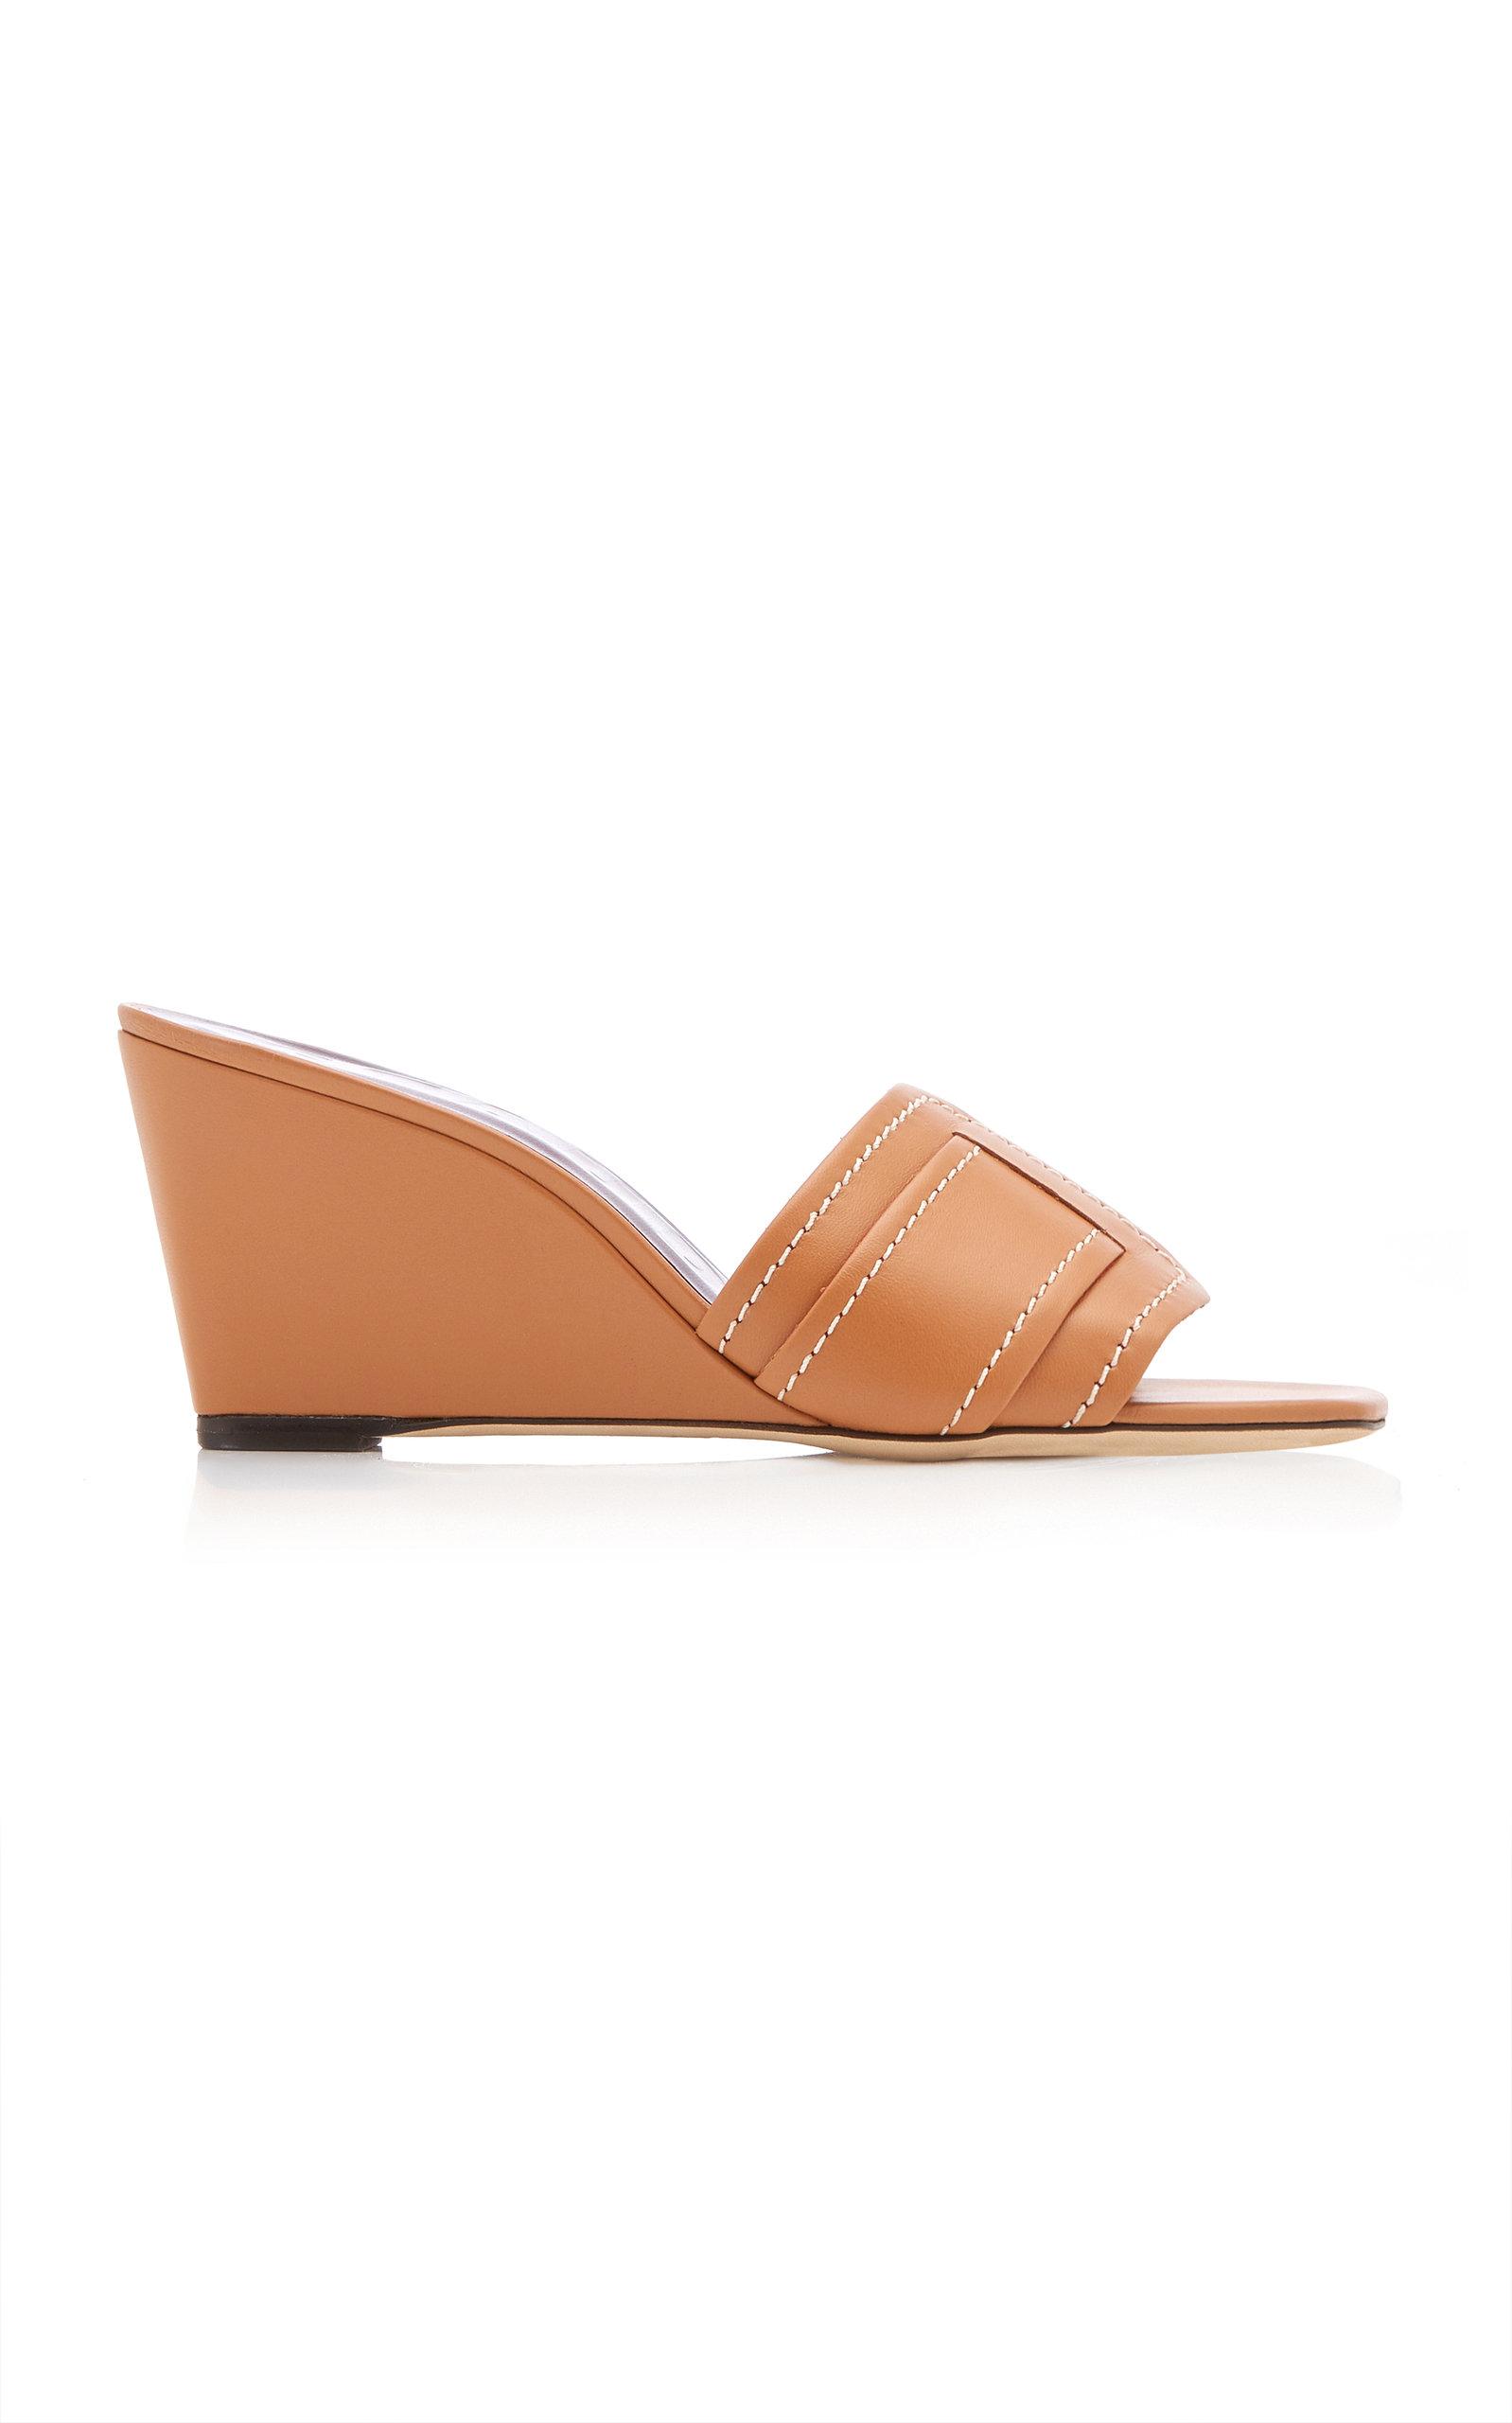 Women's Sylvie Leather Wedge Sandals